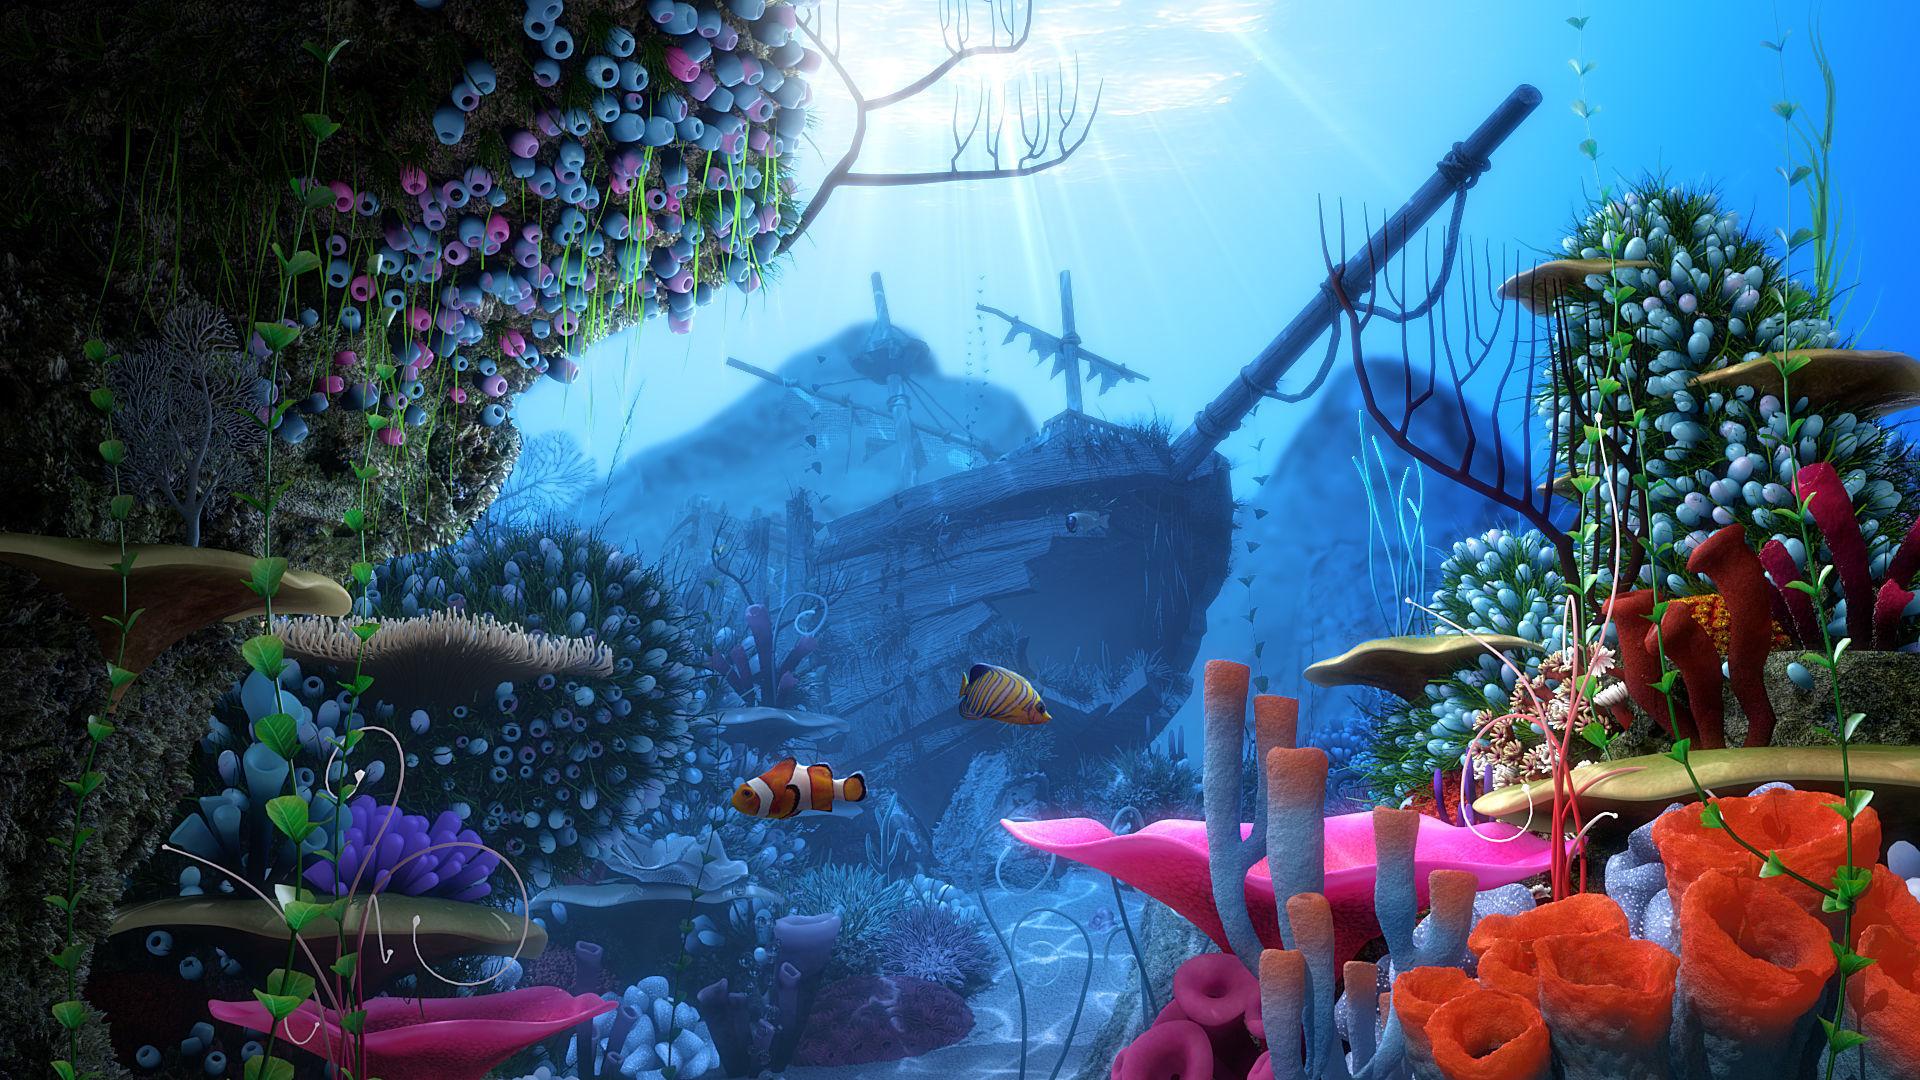 Cartoon Underwater Ship Scene